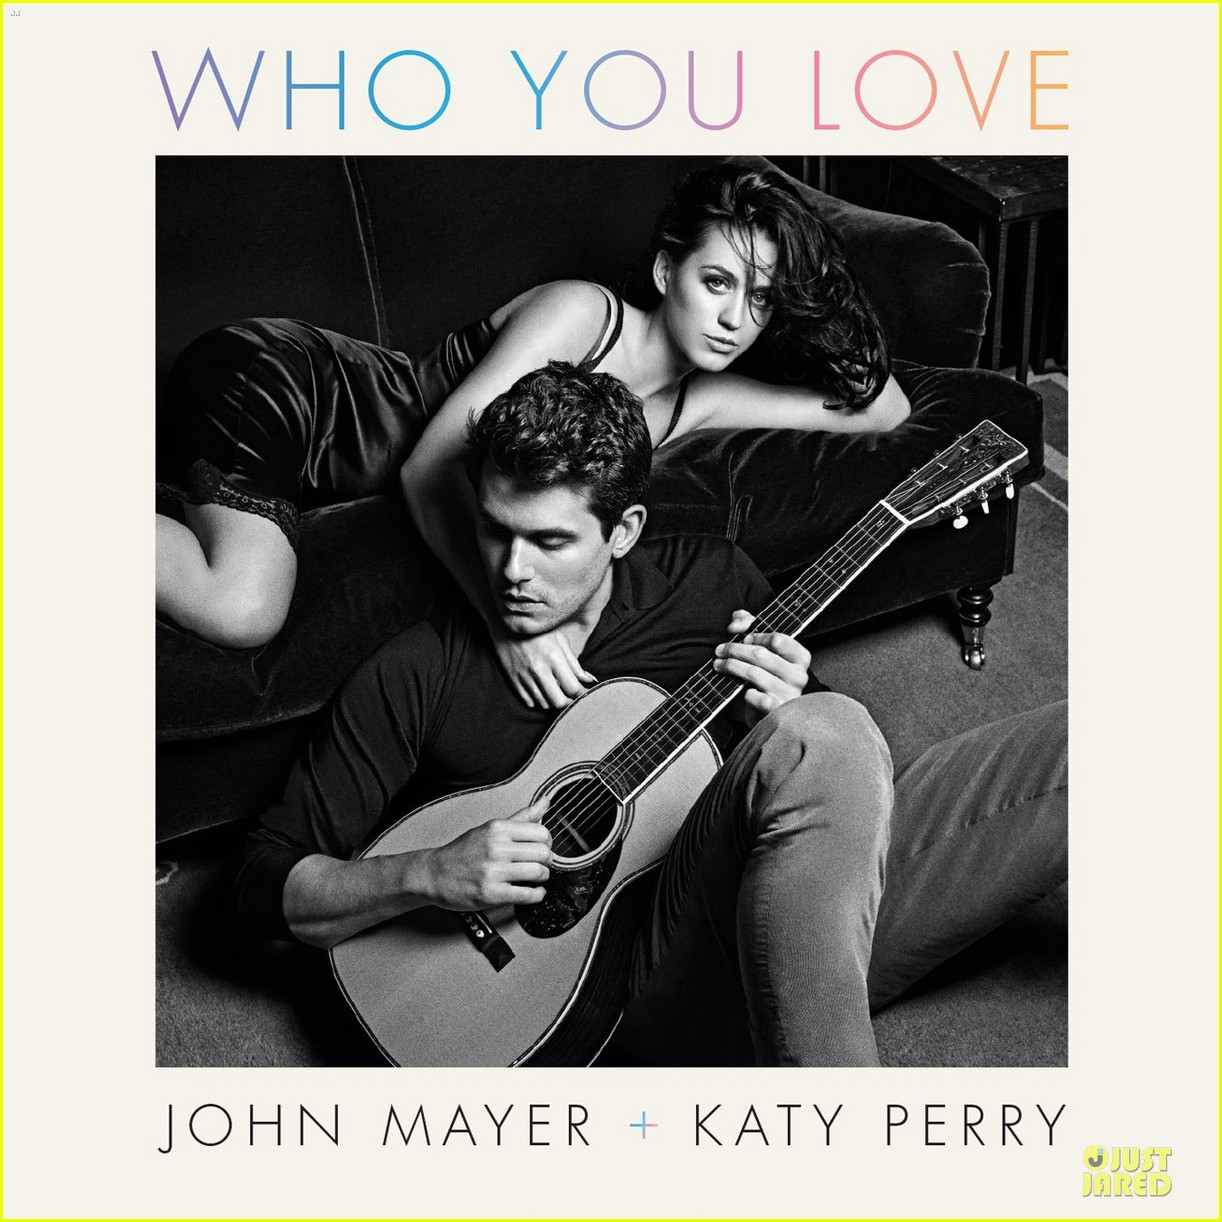 katy perry john mayer who you love artwork 053003604